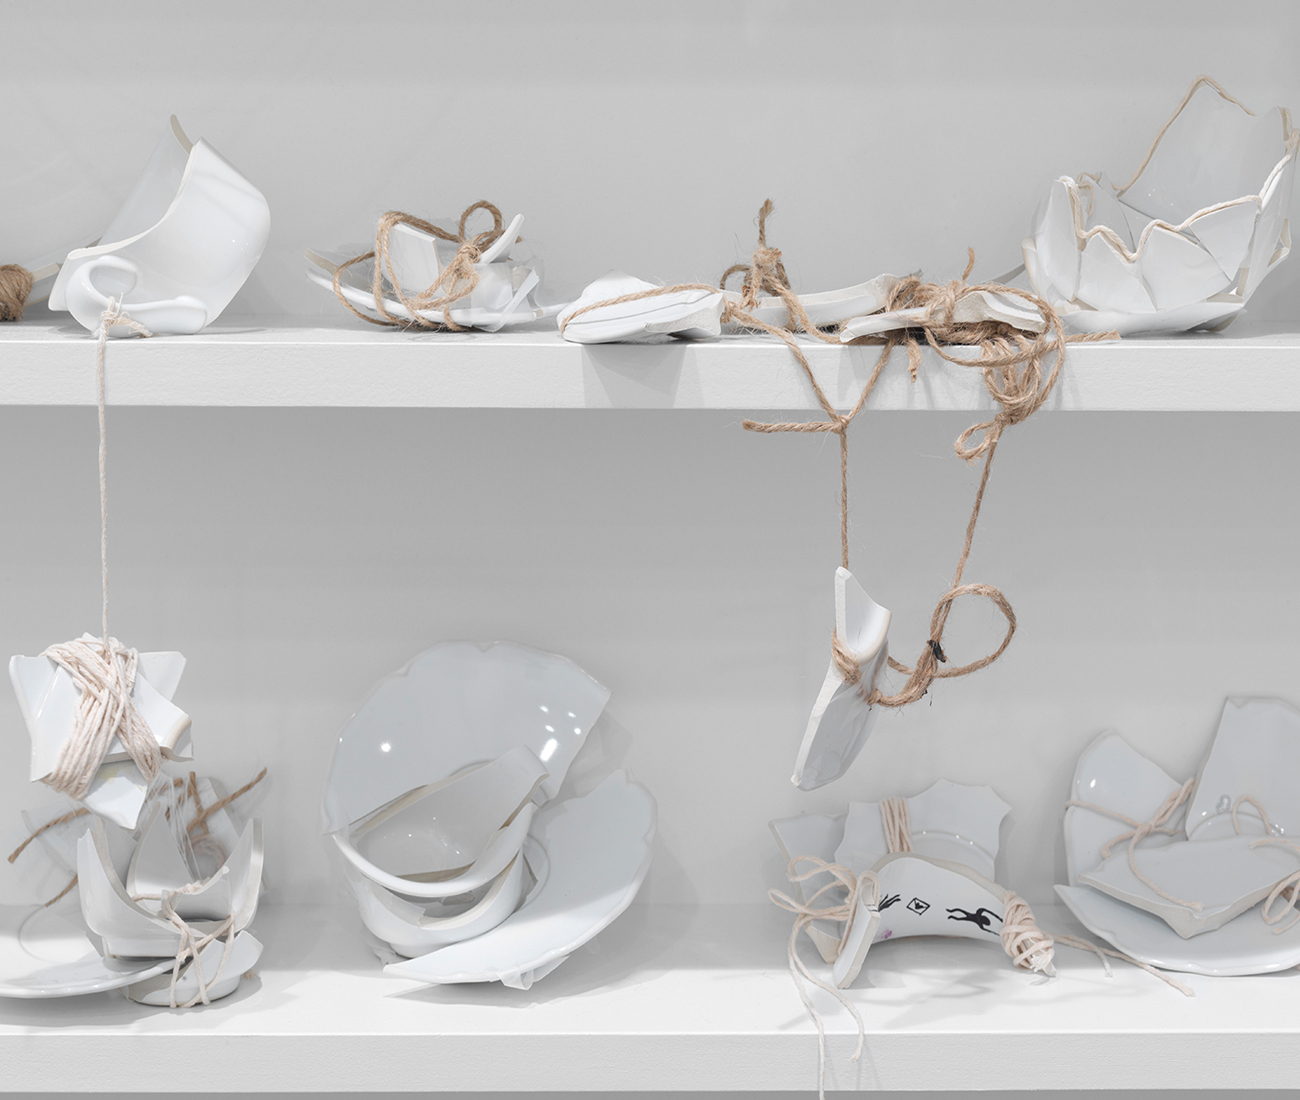 Yoko Ono, Mend Piece (Galerie Lelong, New York 2015/2016)